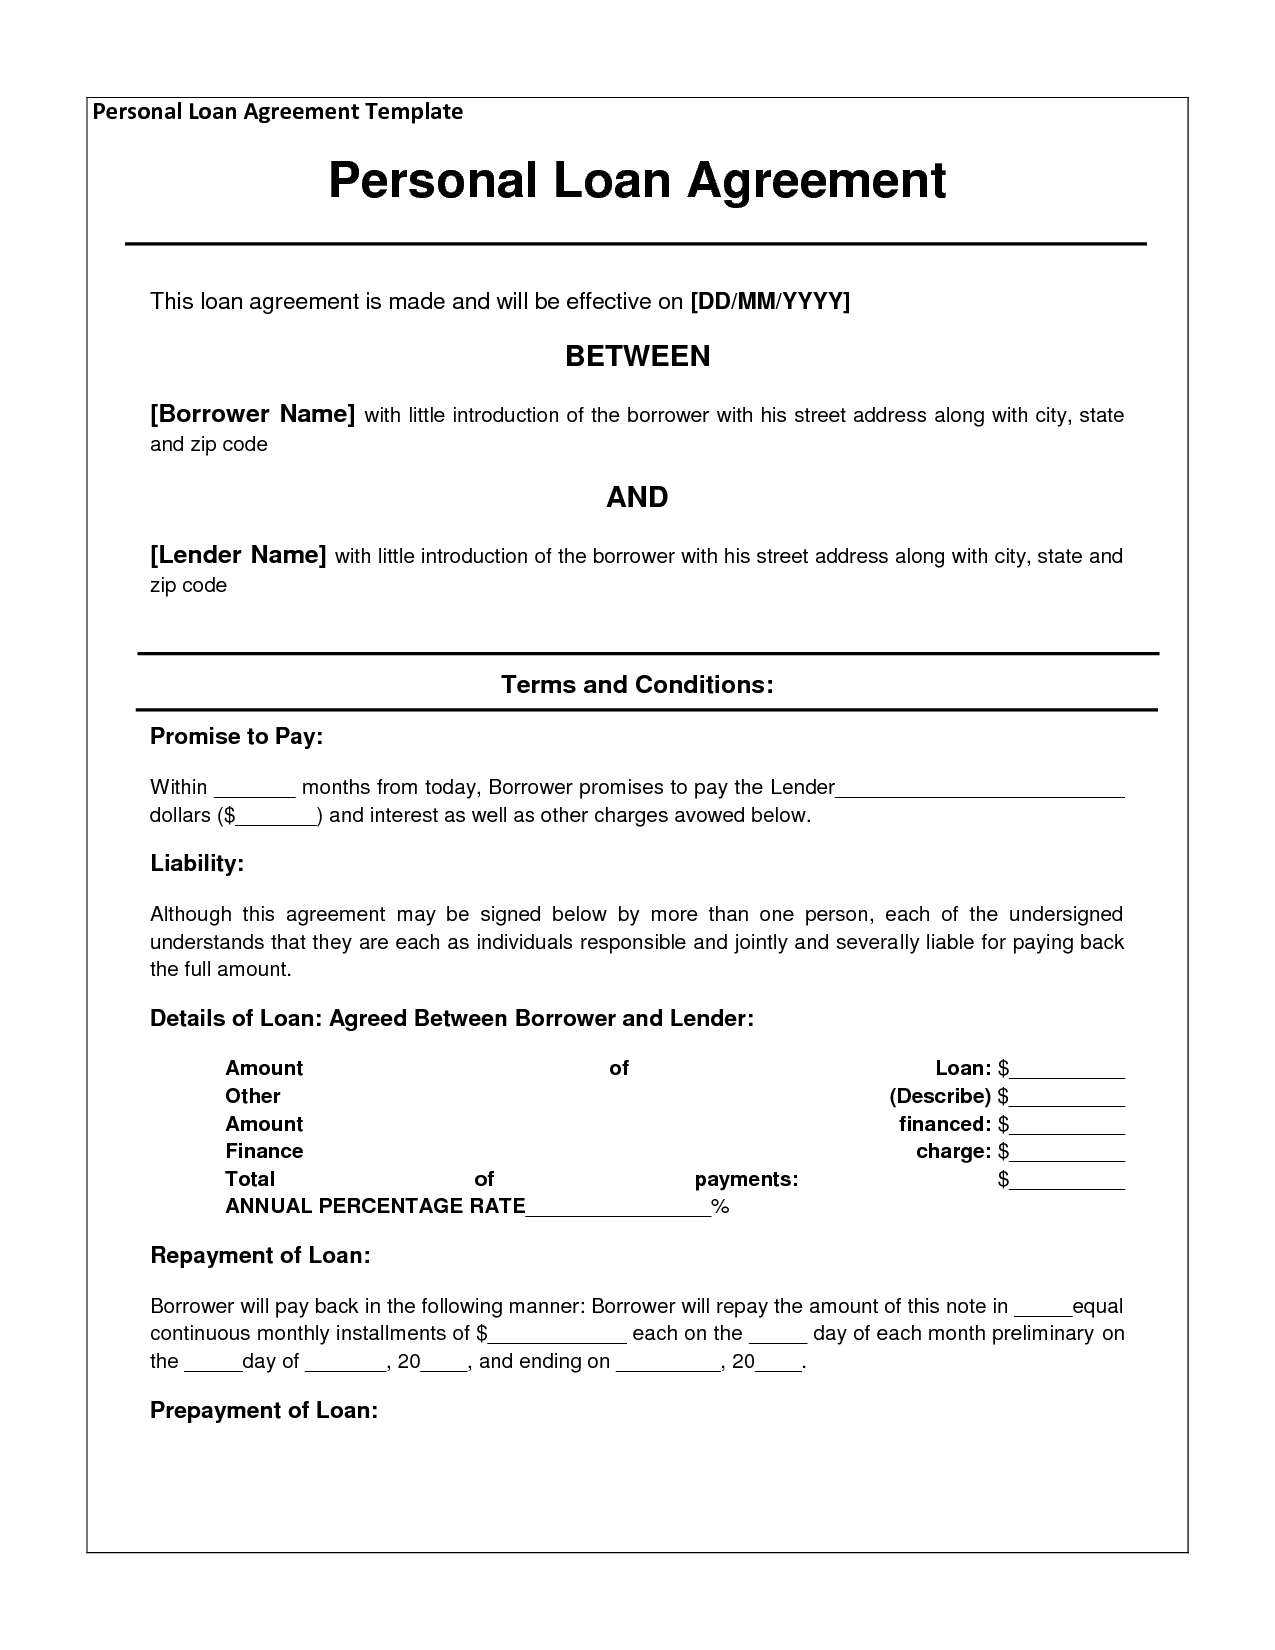 loan agreement between family members template - Template